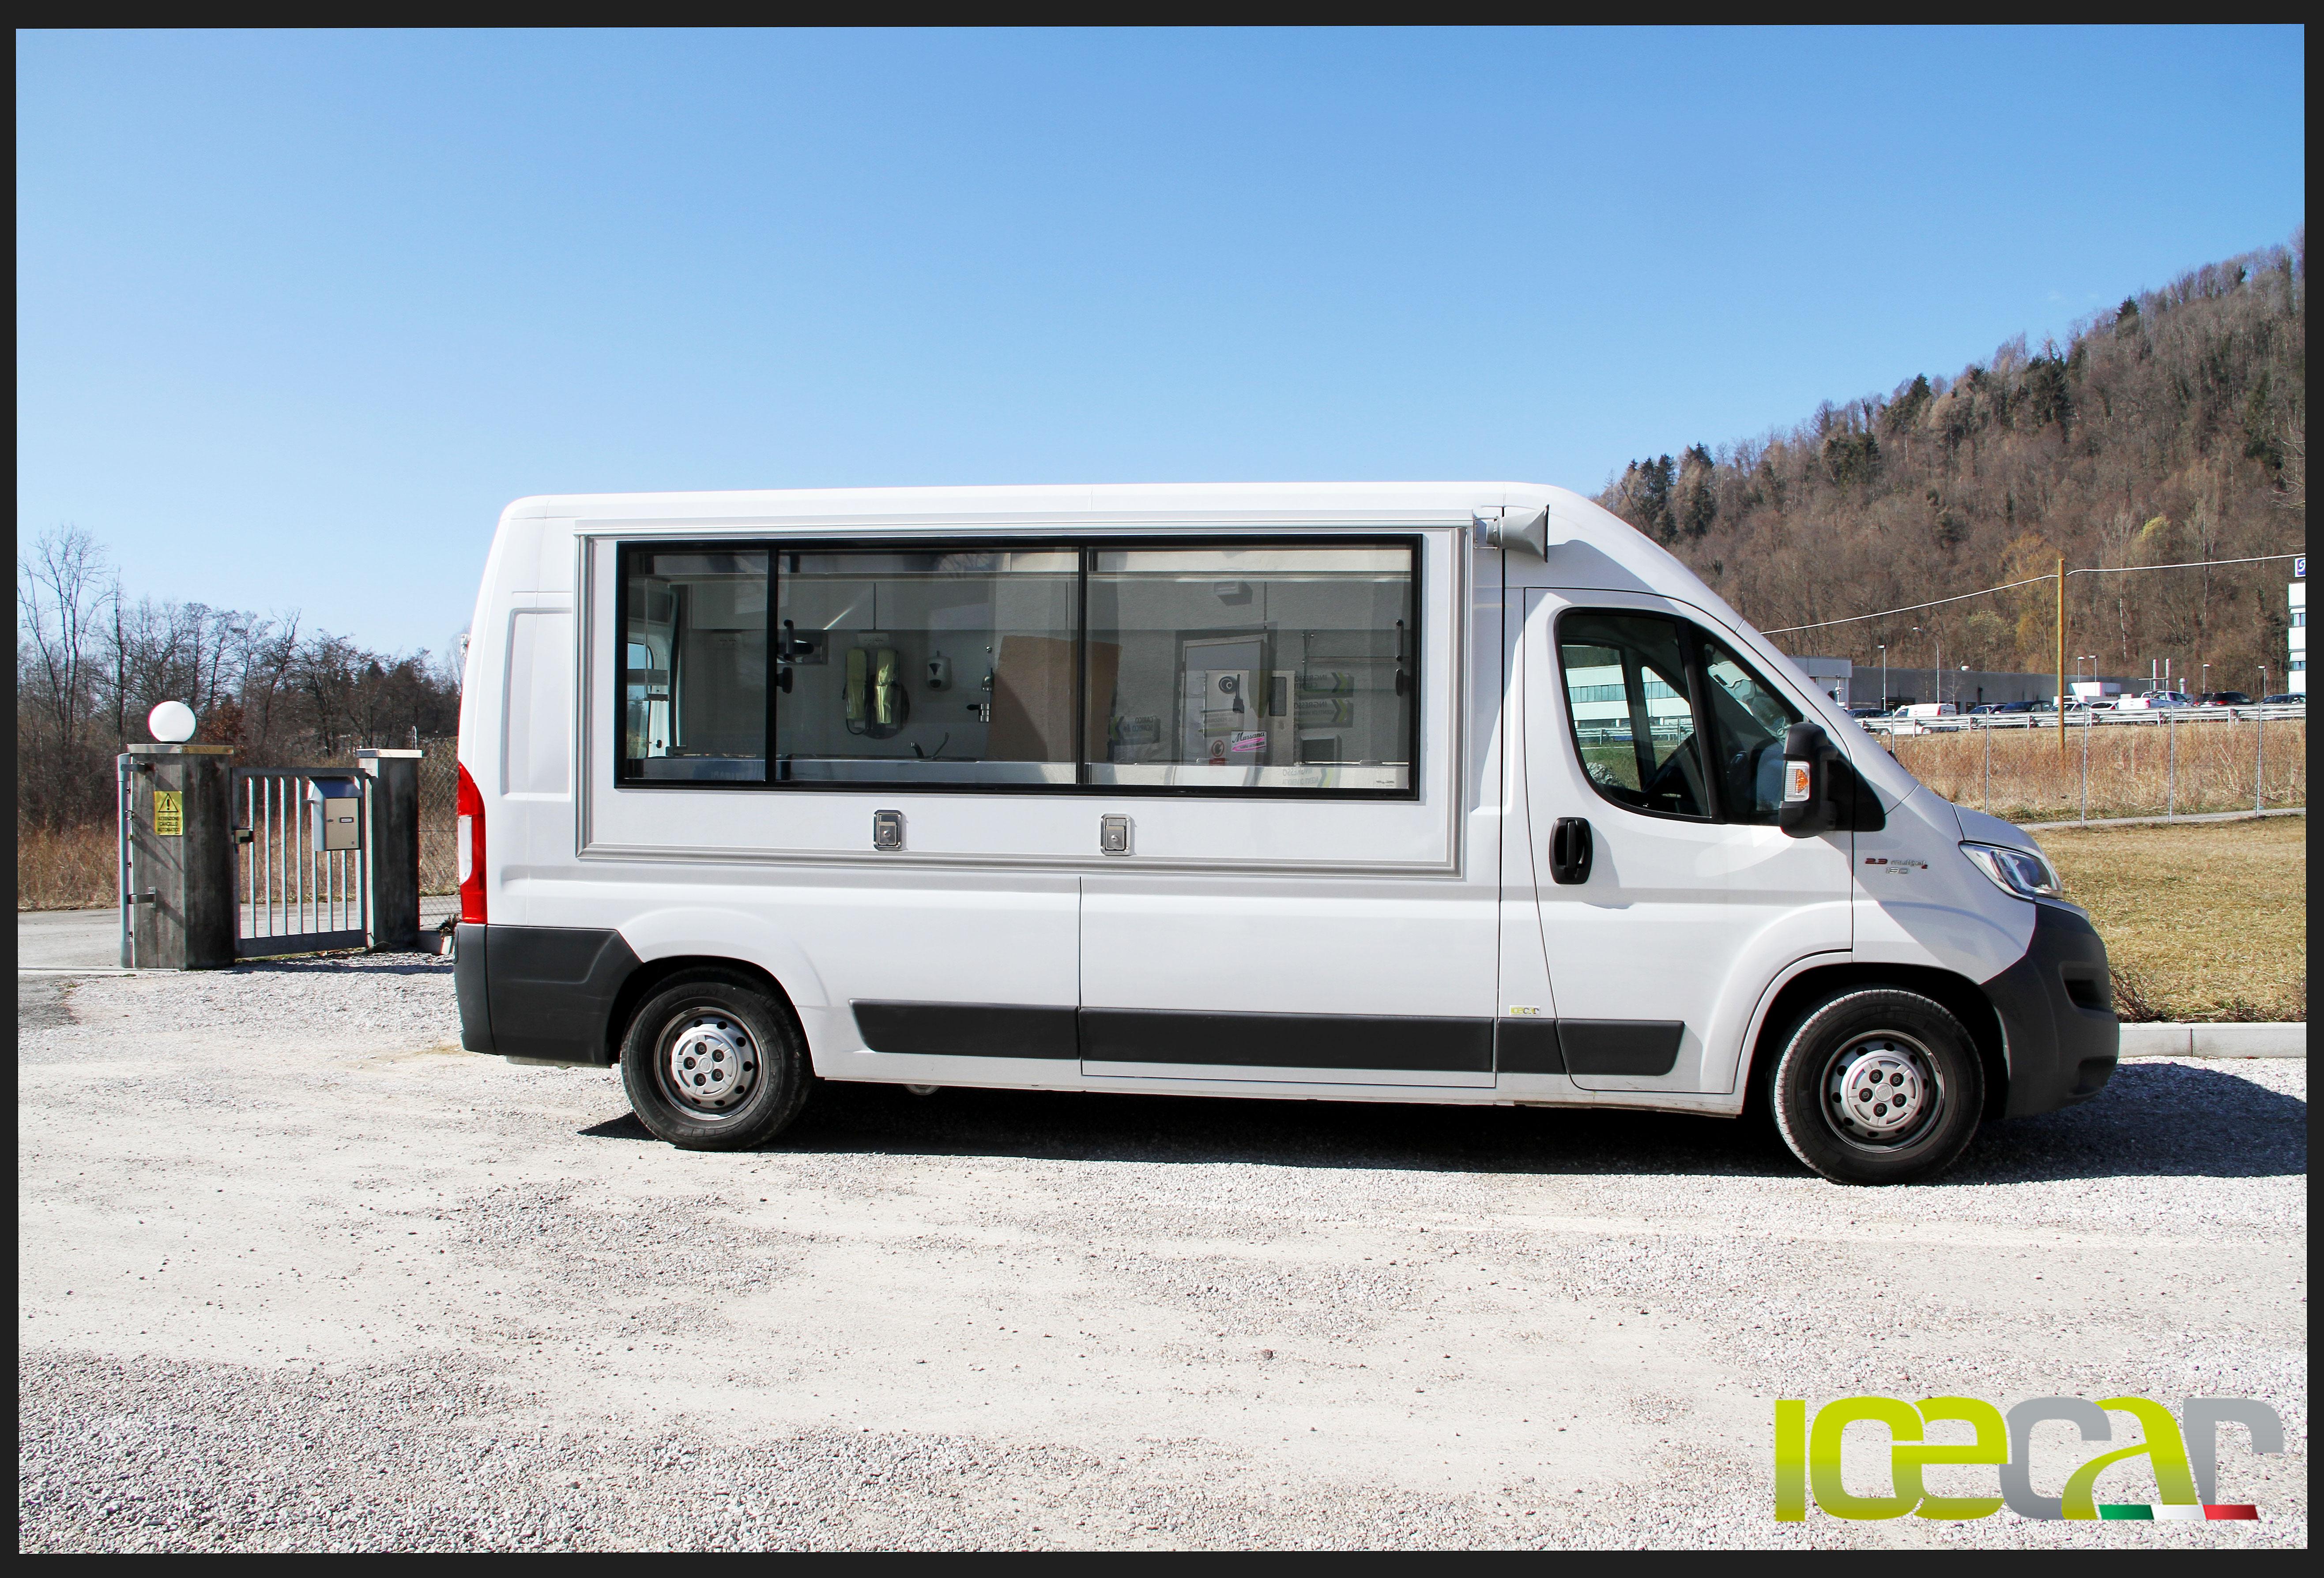 furgone vendita ambulante gelato